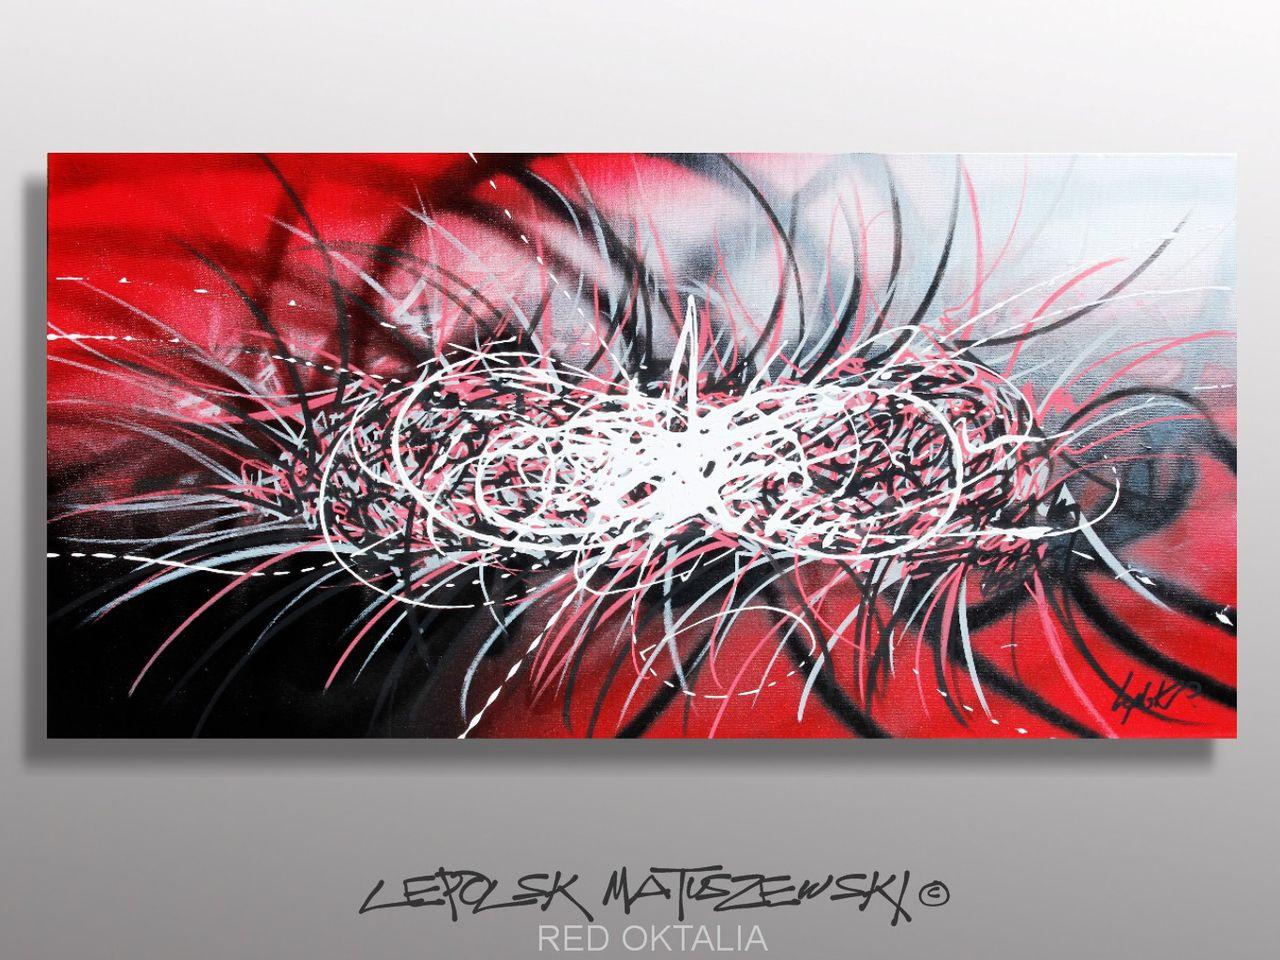 MISTER K  (Lepolsk Matuszewski) RED OKTALIA   street art calligraffiti graffiti abstrait